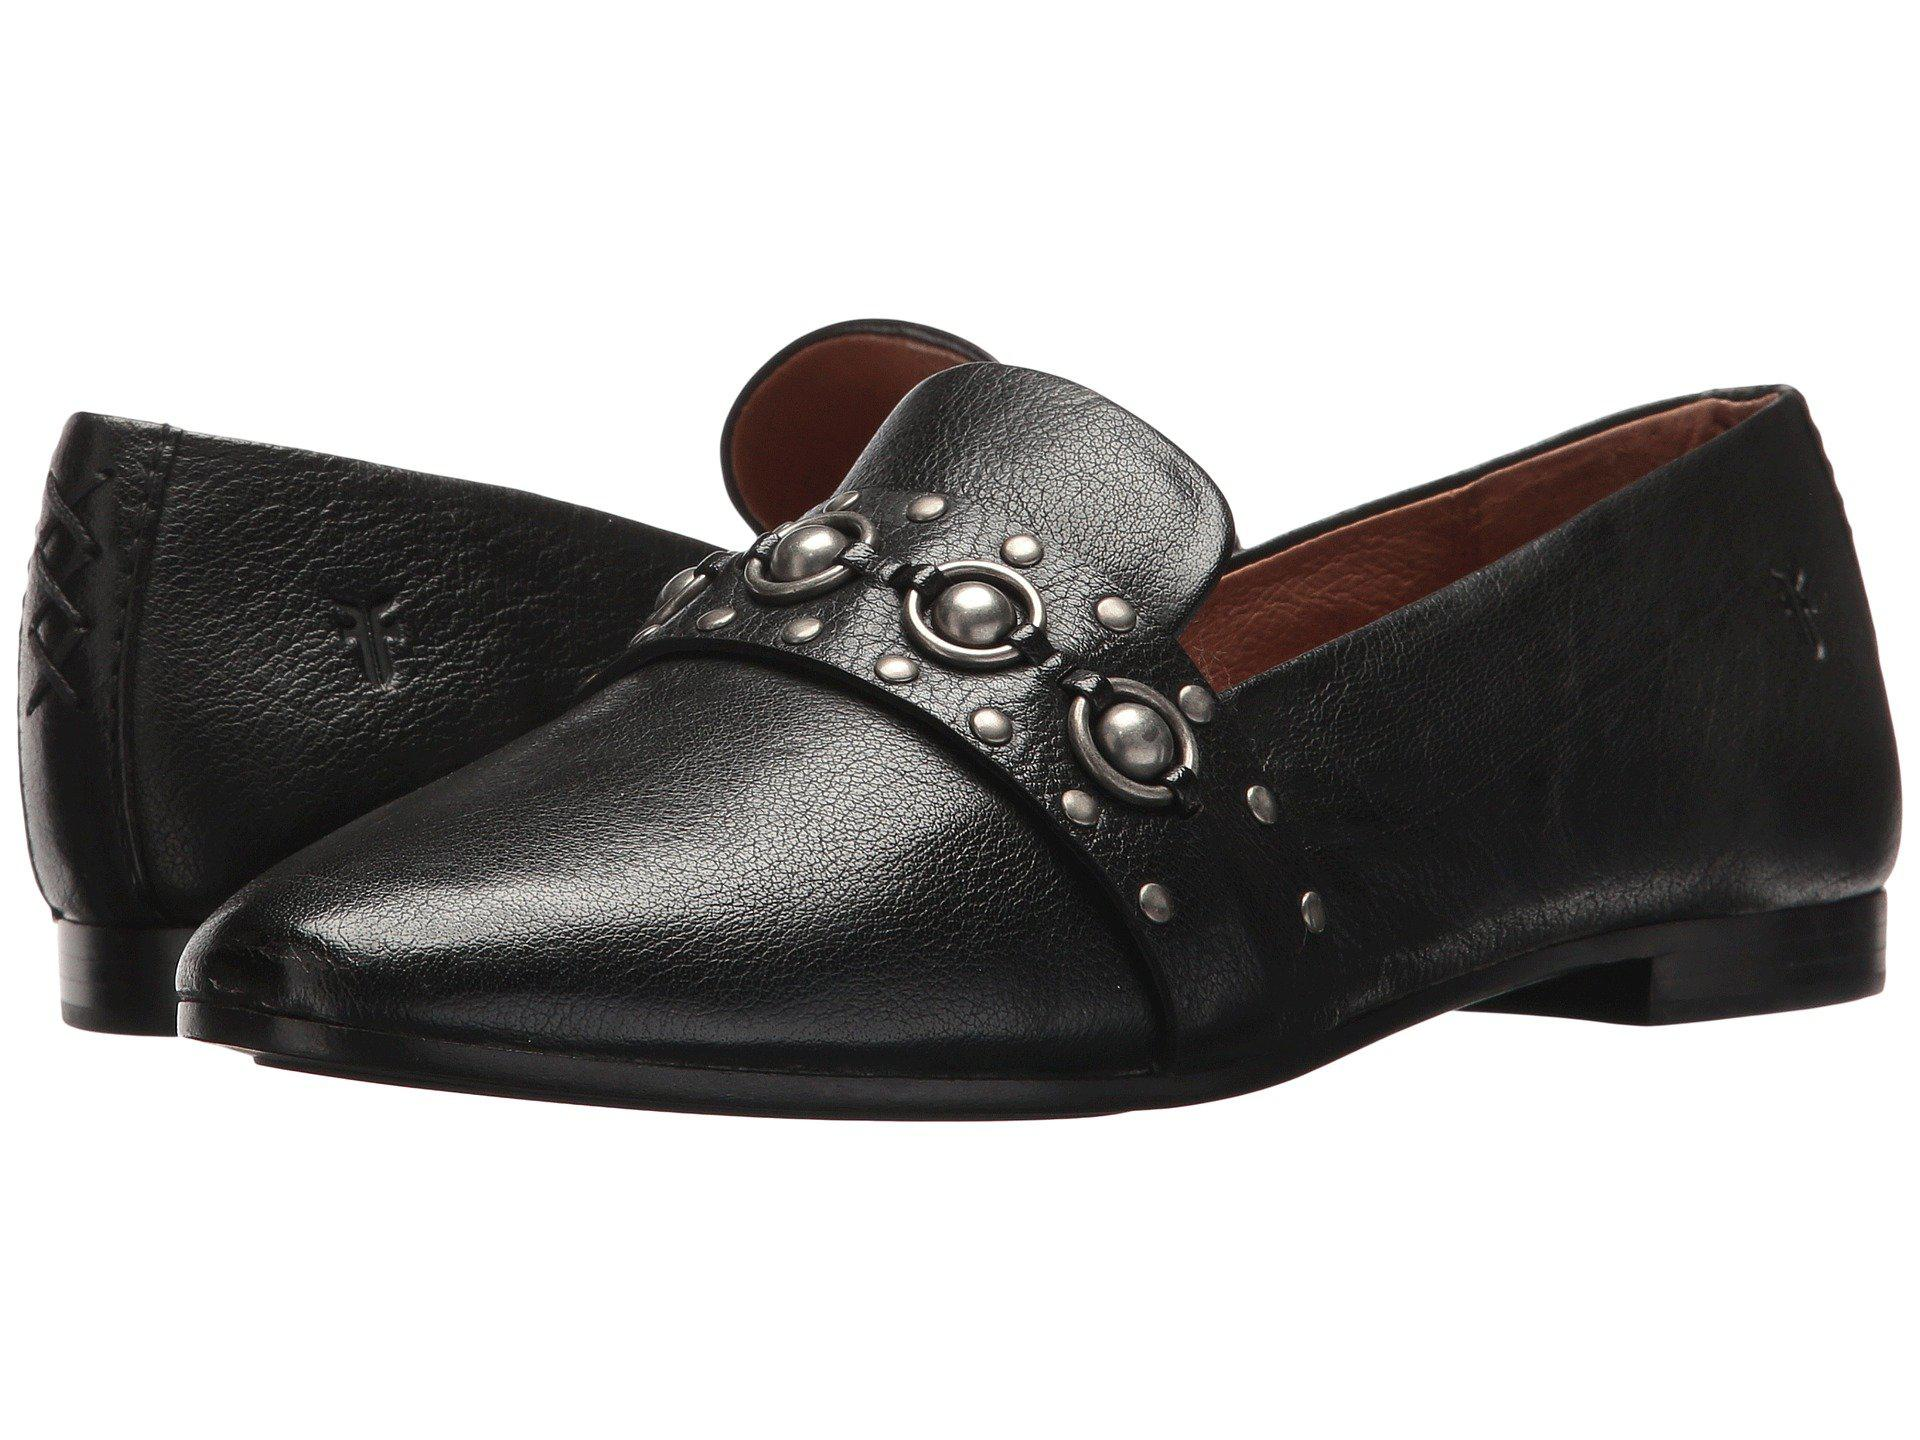 aba6922e4d4 Lyst - Frye Terri Multi Stud Loafer Flat in Black - Save 64%